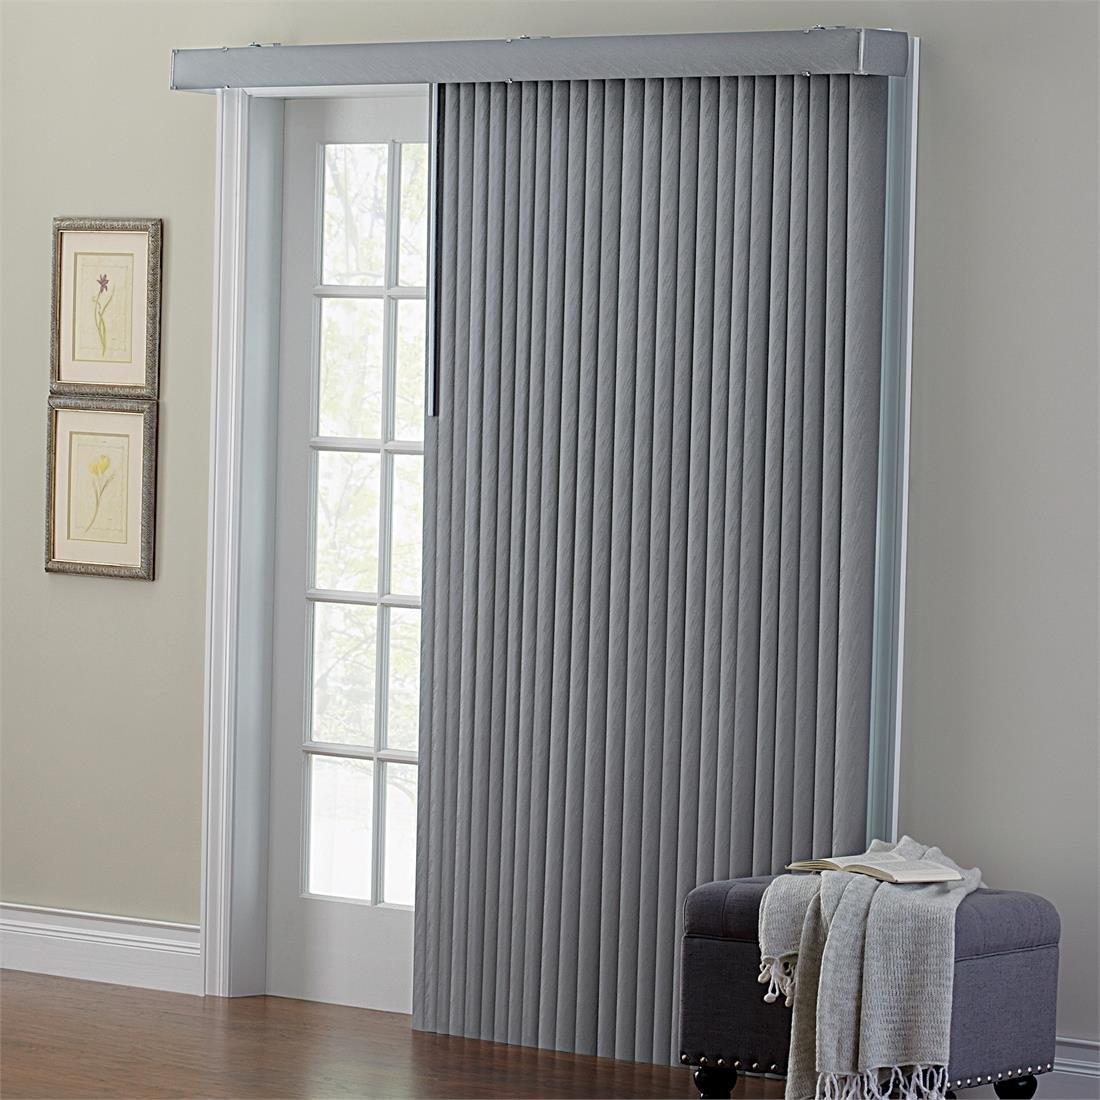 Vertical Blinds For Kitchen Sliding Doors